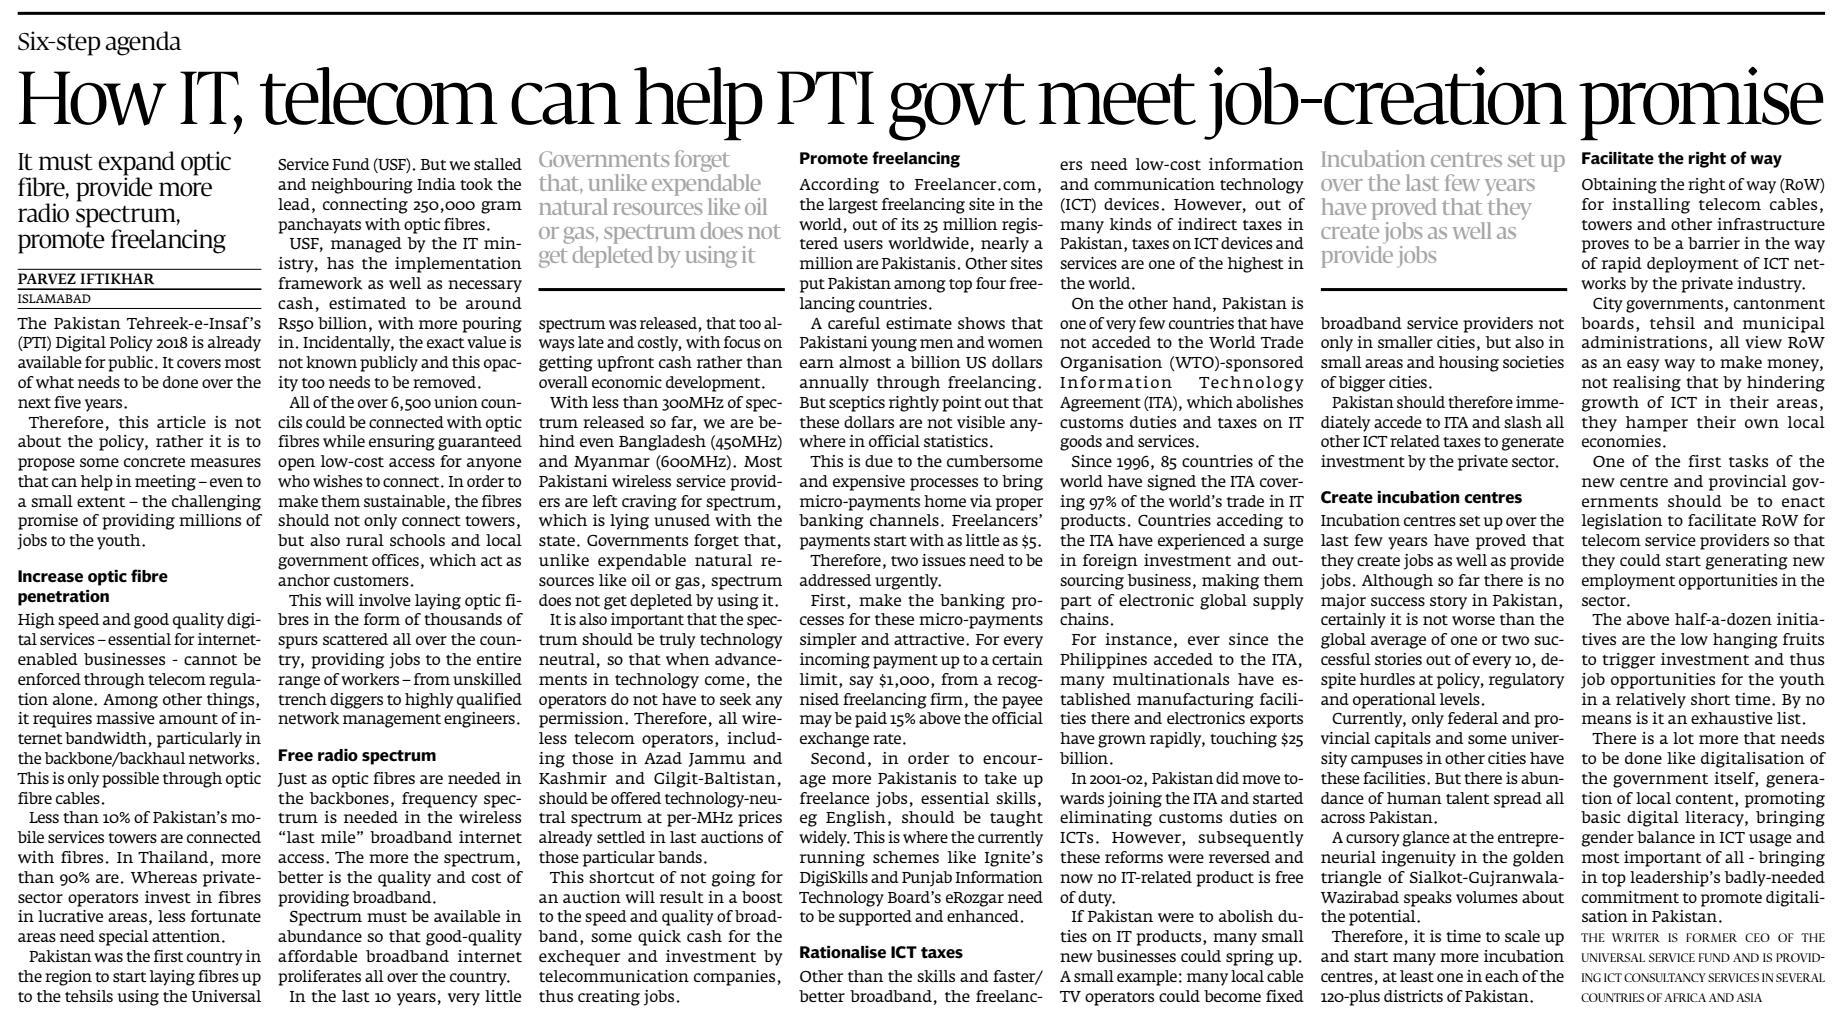 How IT, telecom can help PTA govt meet job-creation promise